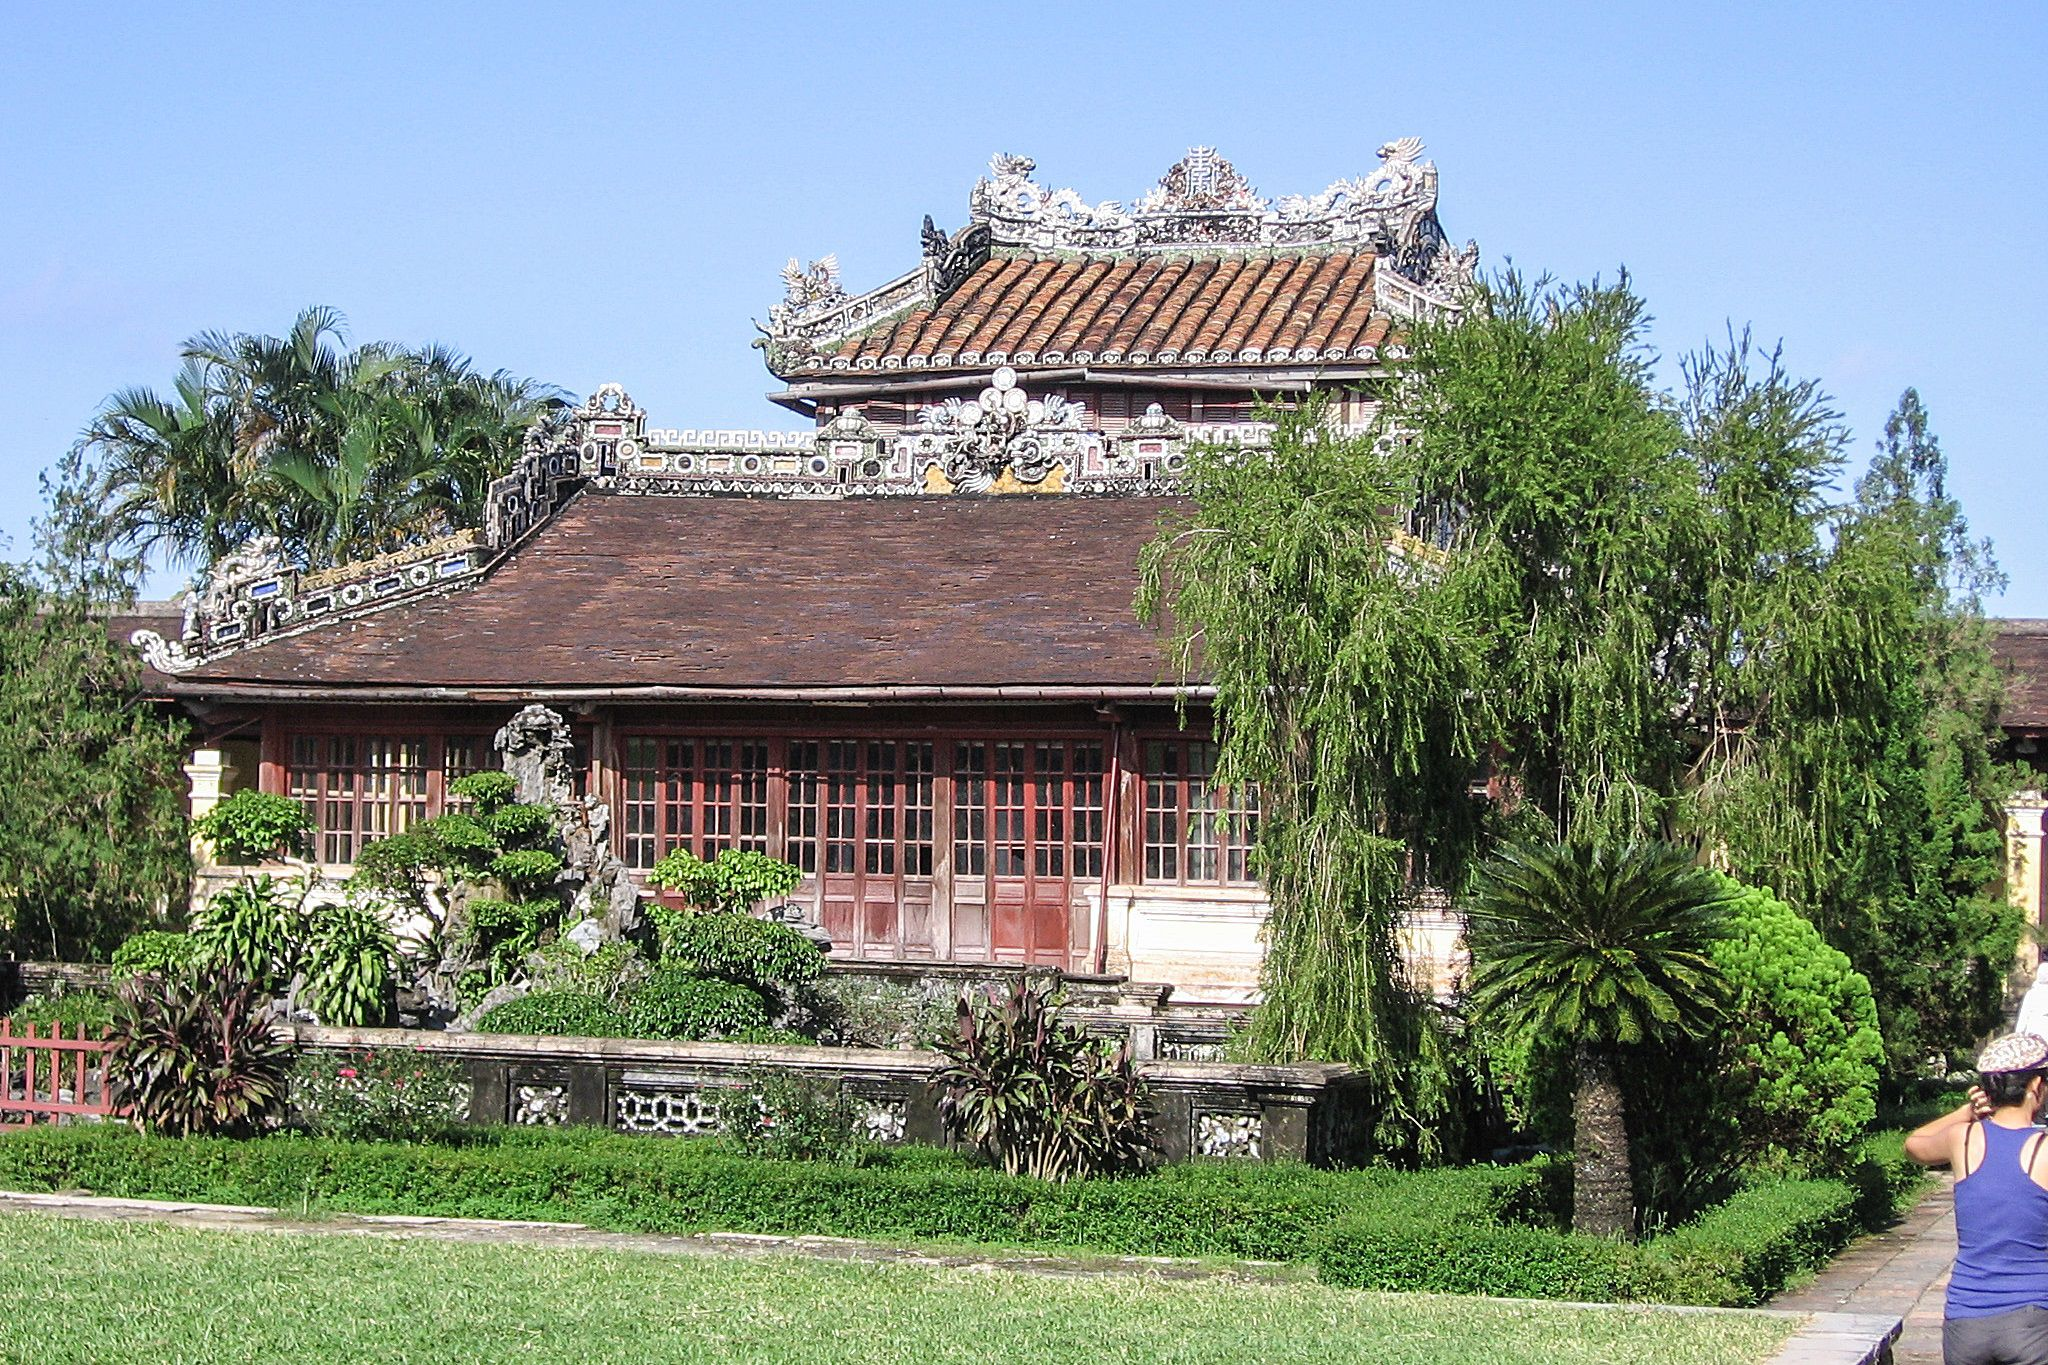 Facade of Emperor's Reading Room, Hue Citadel, Vietnam.